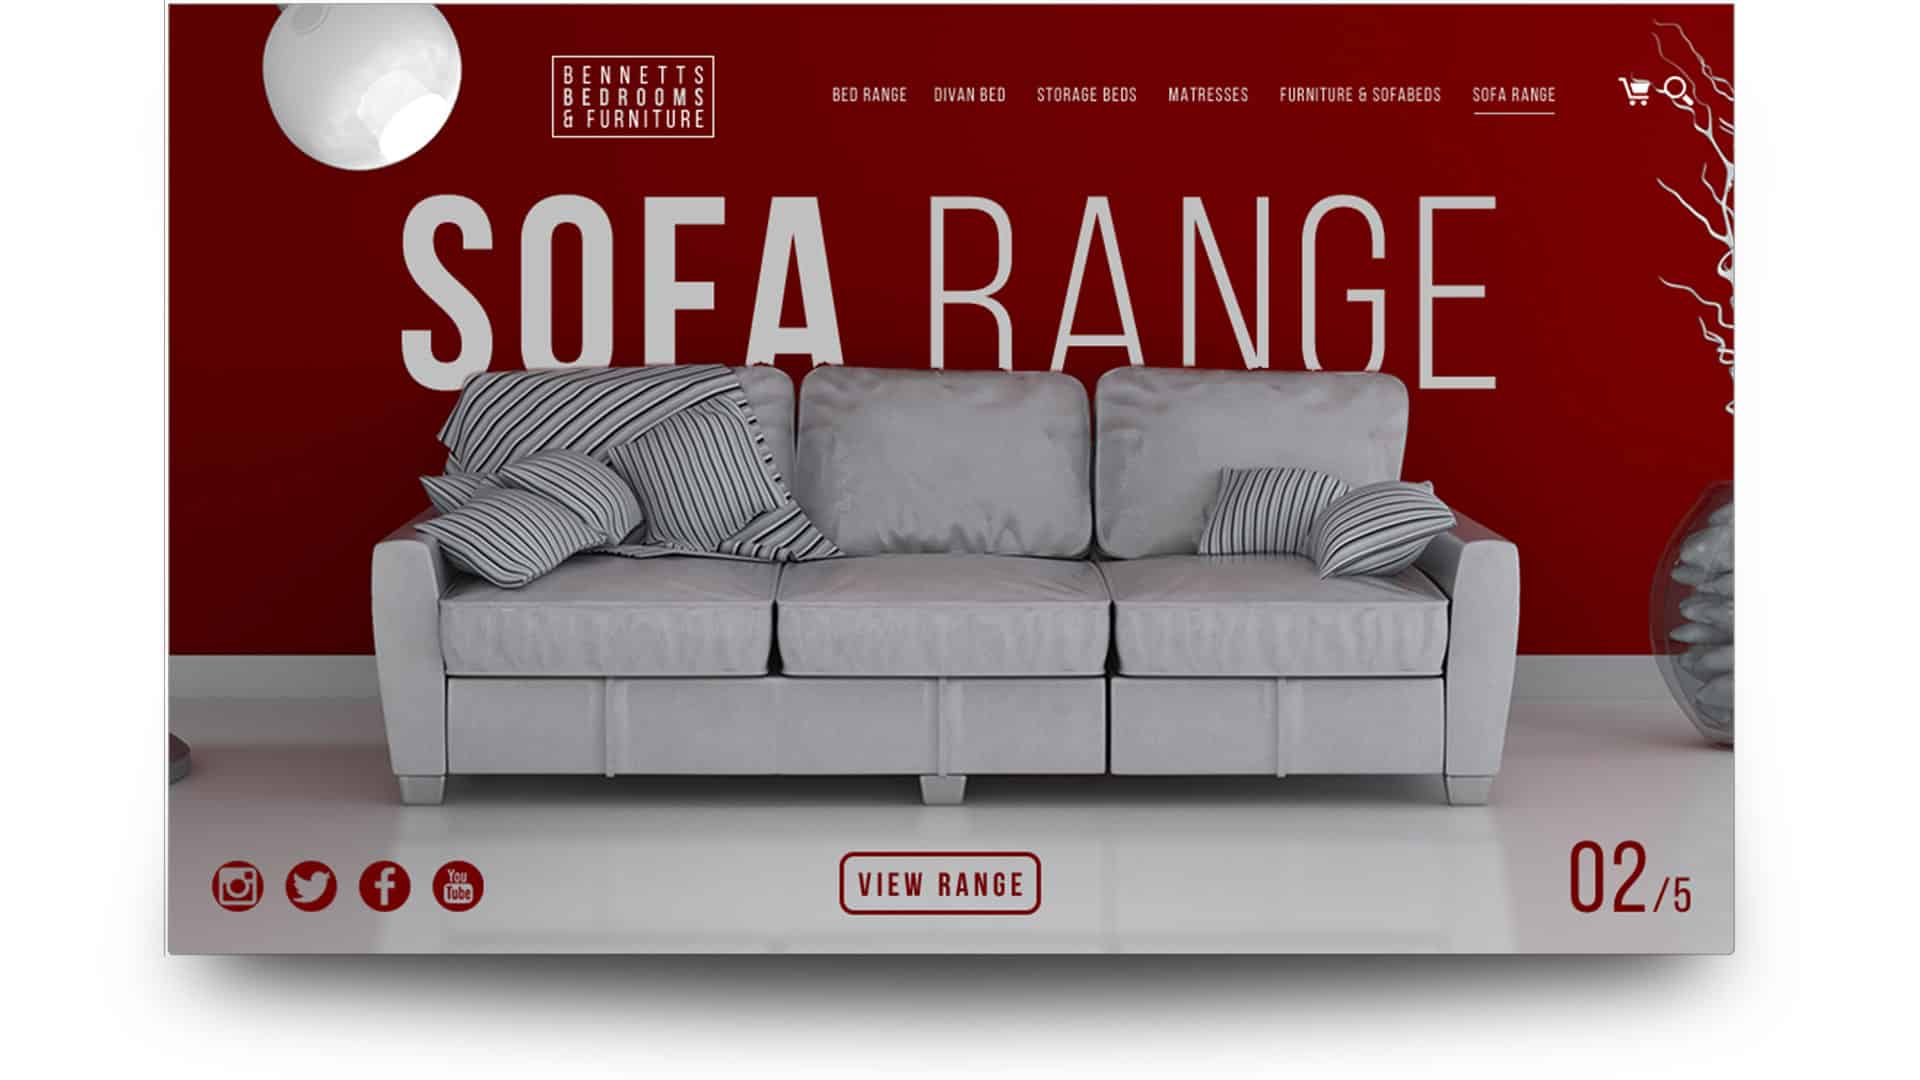 bennets furniture - wordpress website design